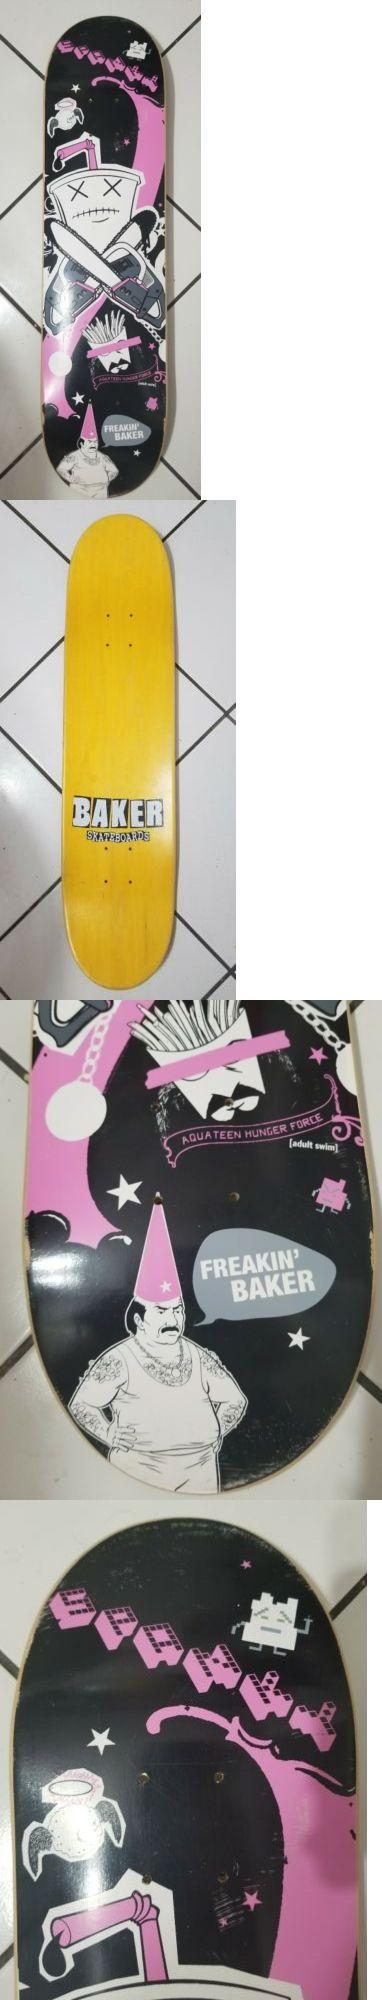 Decks 16263: Nos Spanky Aqua Teen Hunger Force Baker Skateboards Deck -> BUY IT NOW ONLY: $85 on eBay!